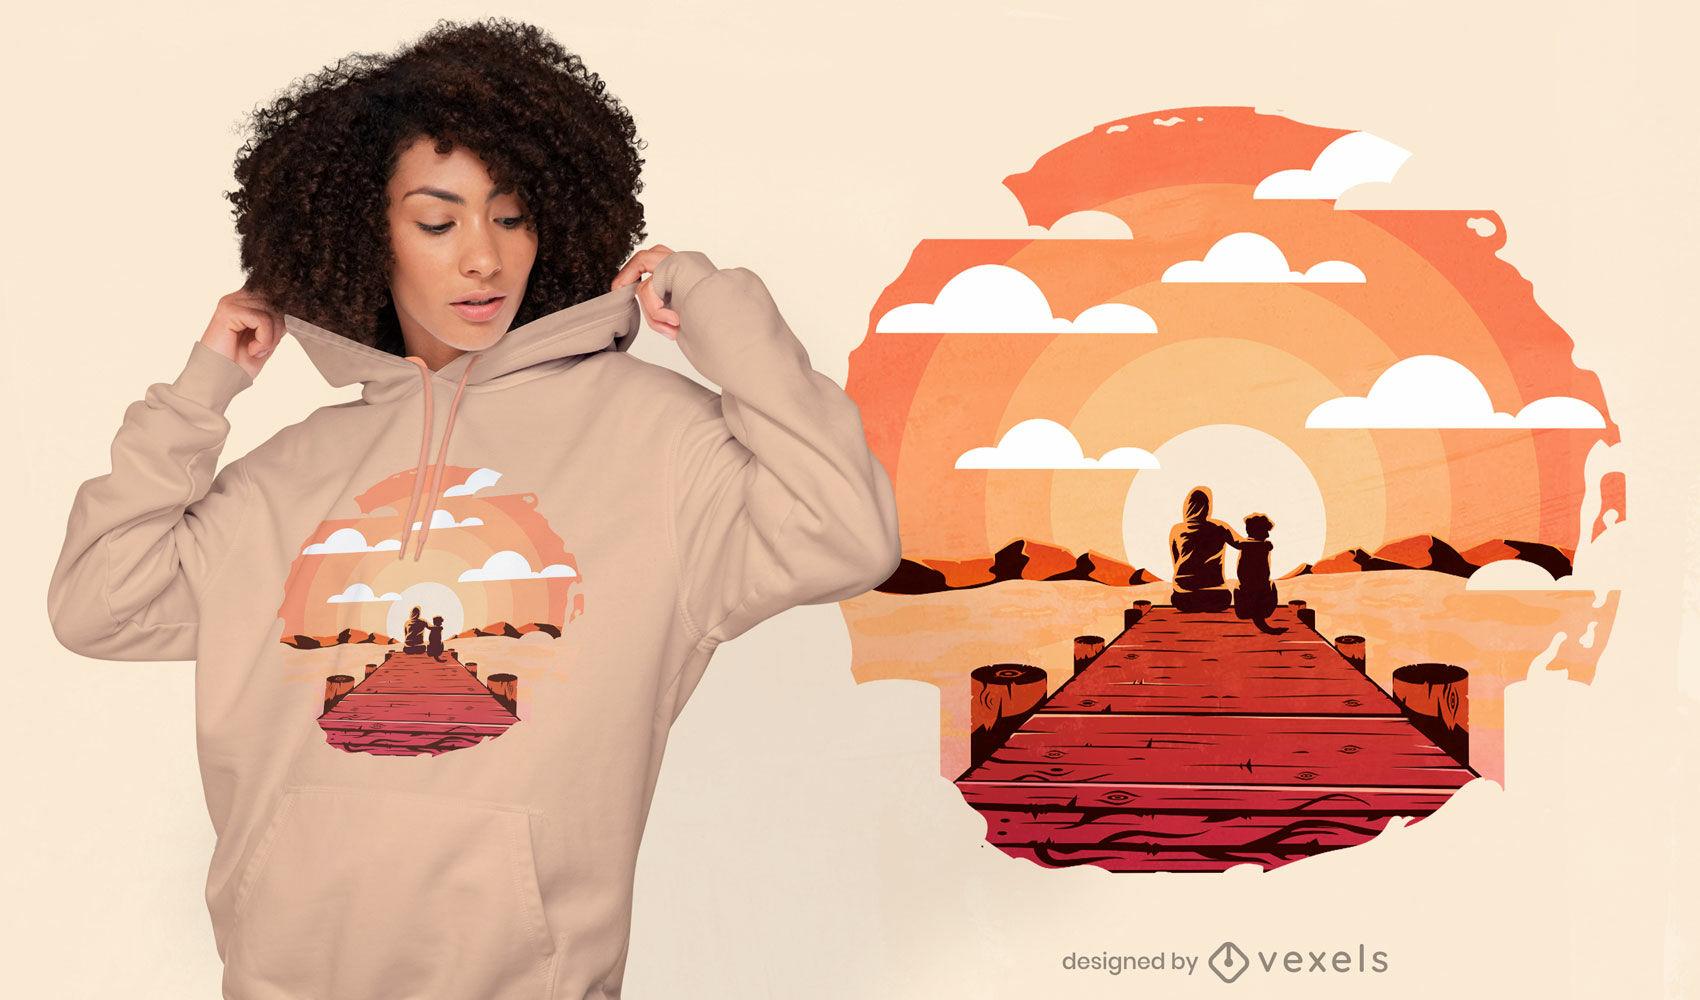 Woman and dog pier t-shirt design